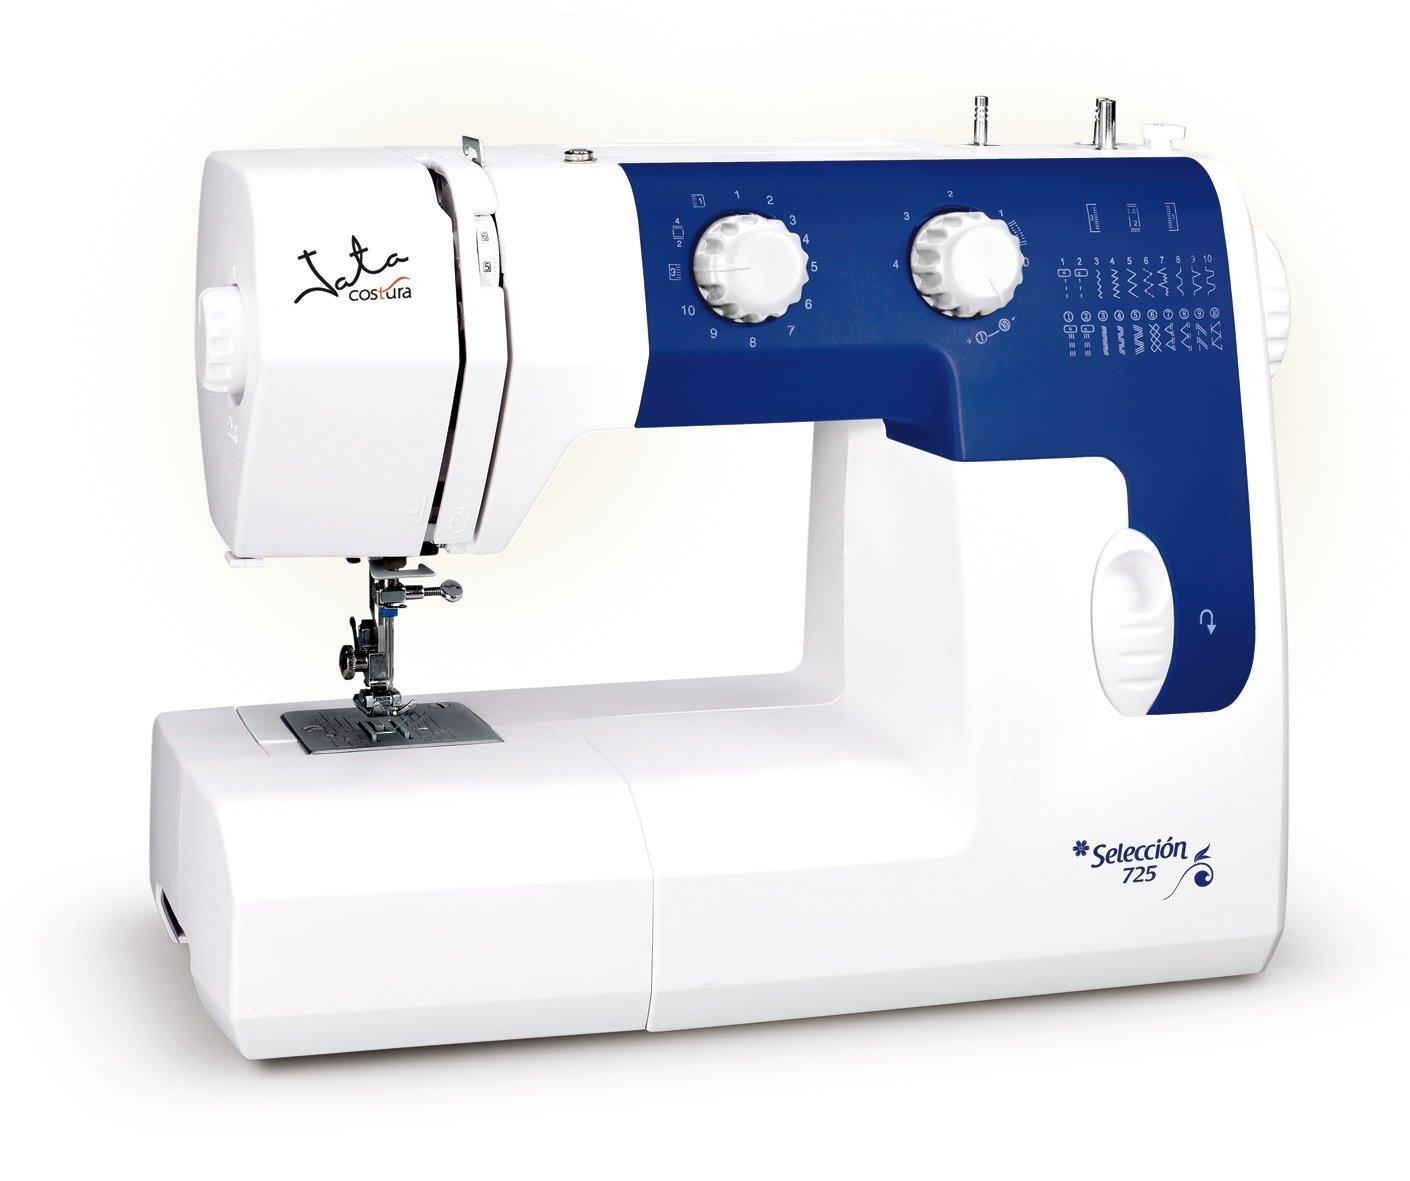 JATA MC725 - Máquina de coser, 20 diseños de puntada: Amazon.es: Hogar